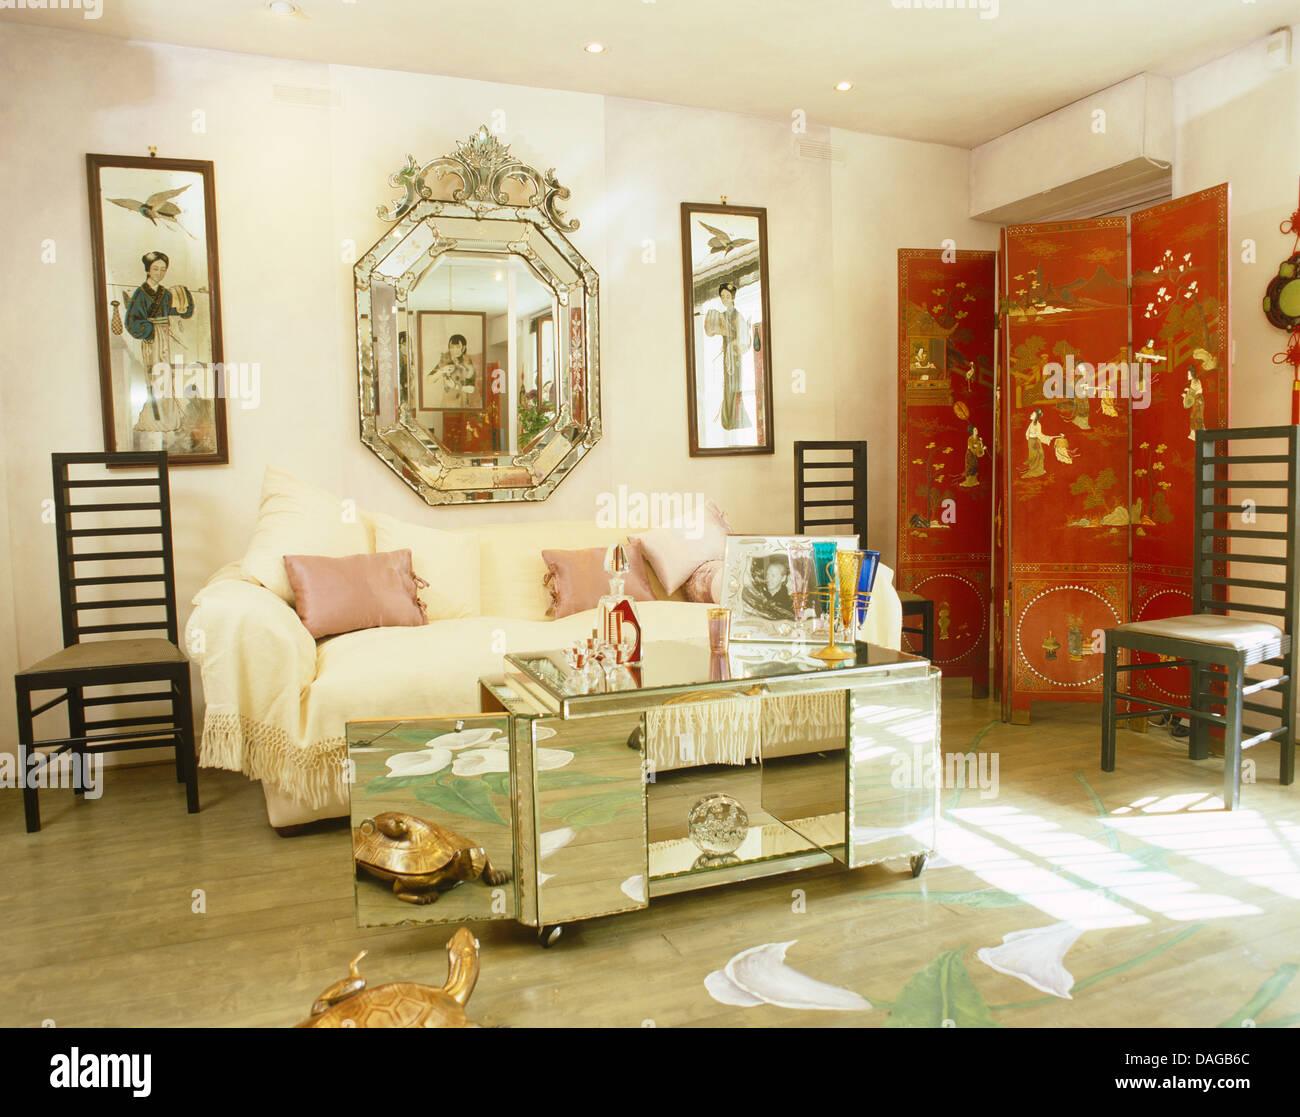 antique venetian mirror above sofa with cream throw in living room